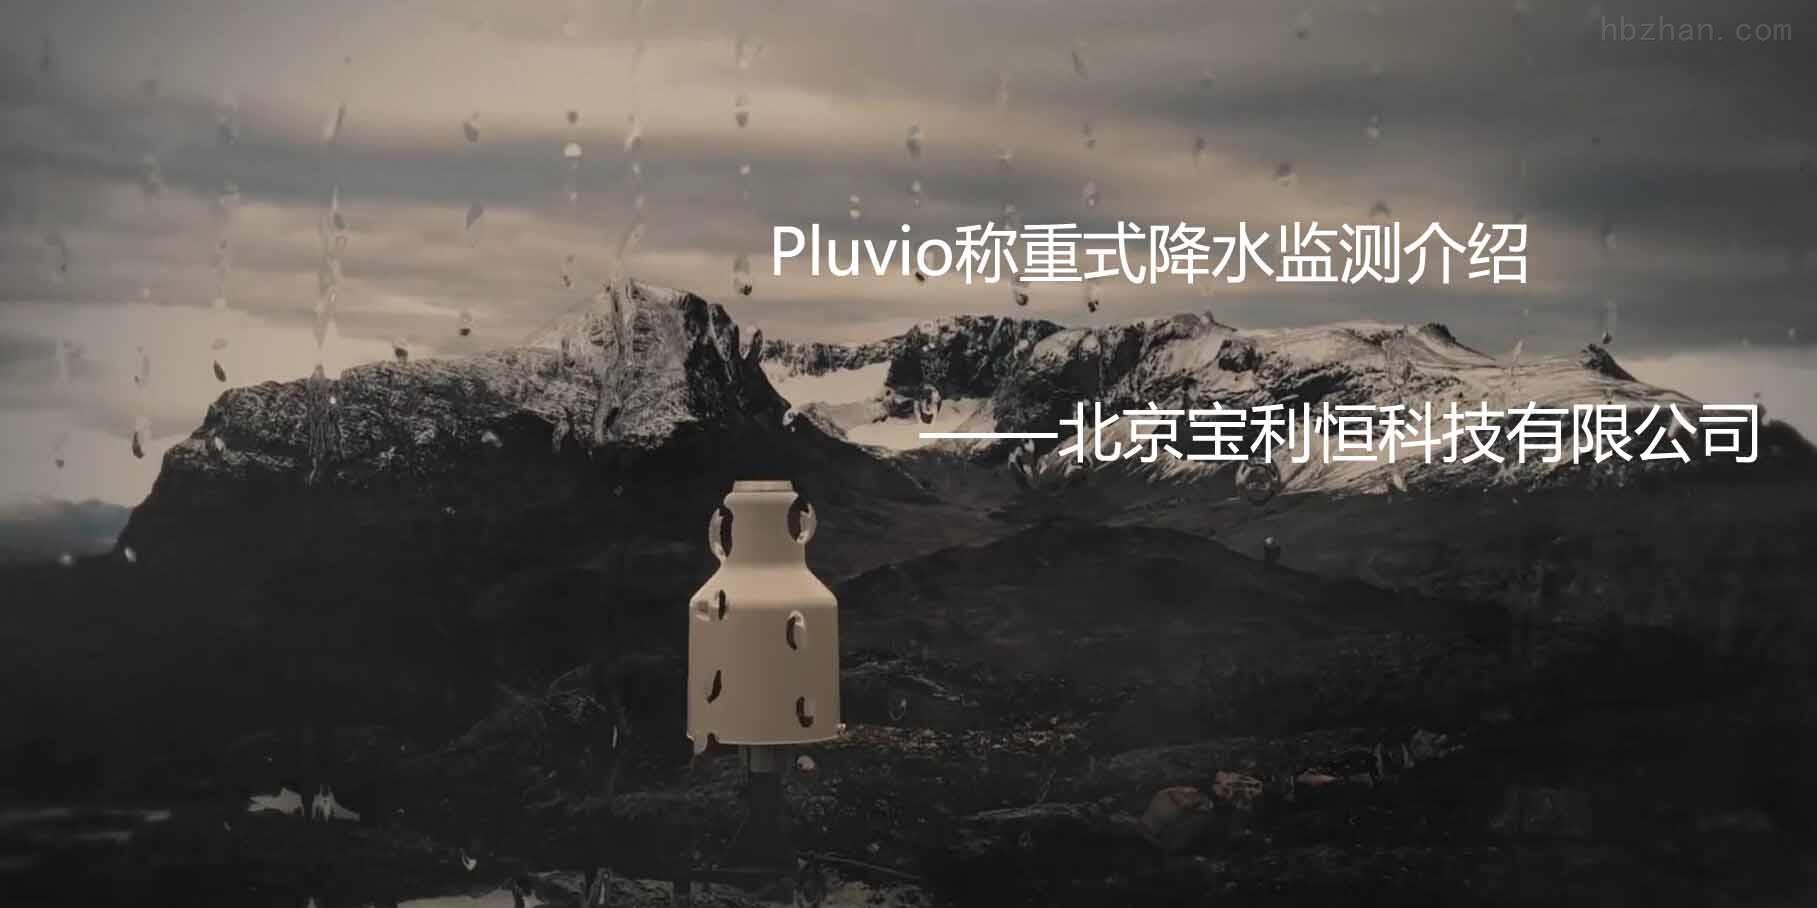 Pluvio称重式降水监测